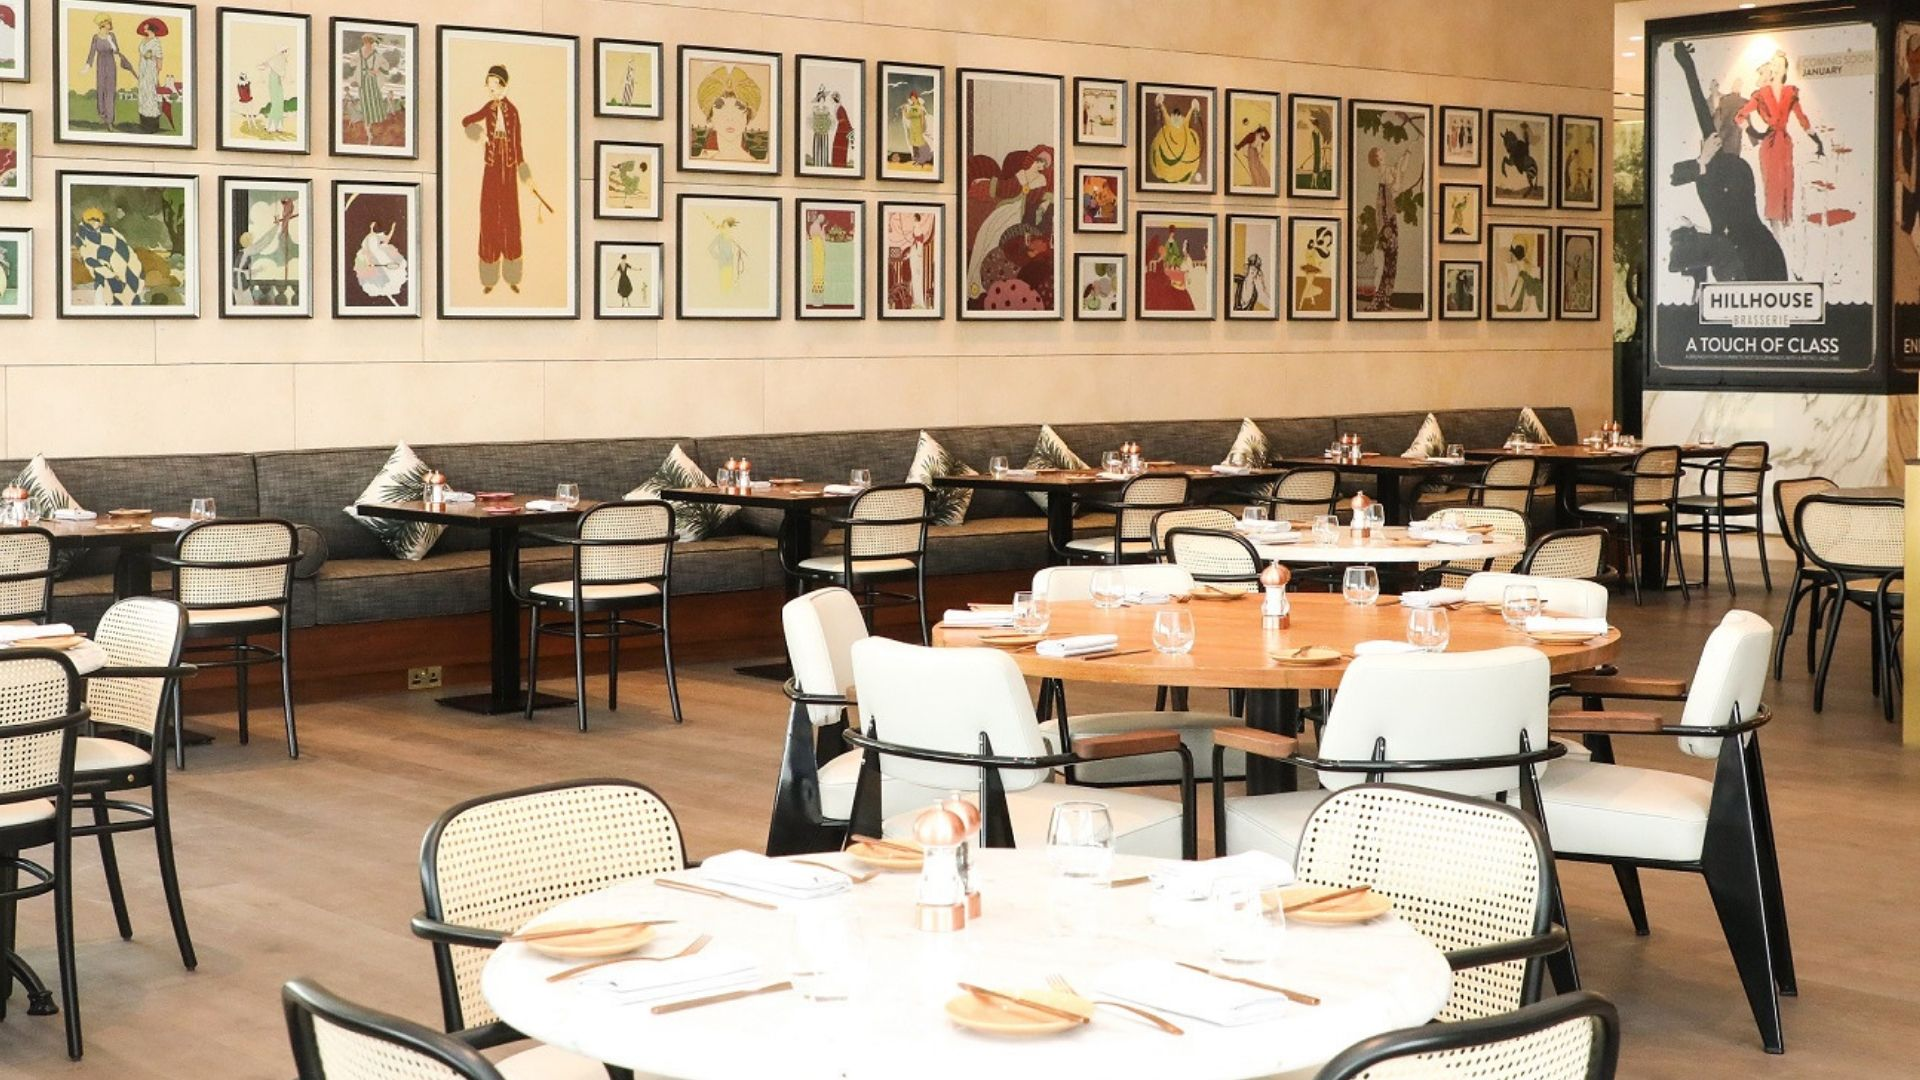 Hillhouse-Brasserie--Brunch-Interiors-Dubai-art-deco